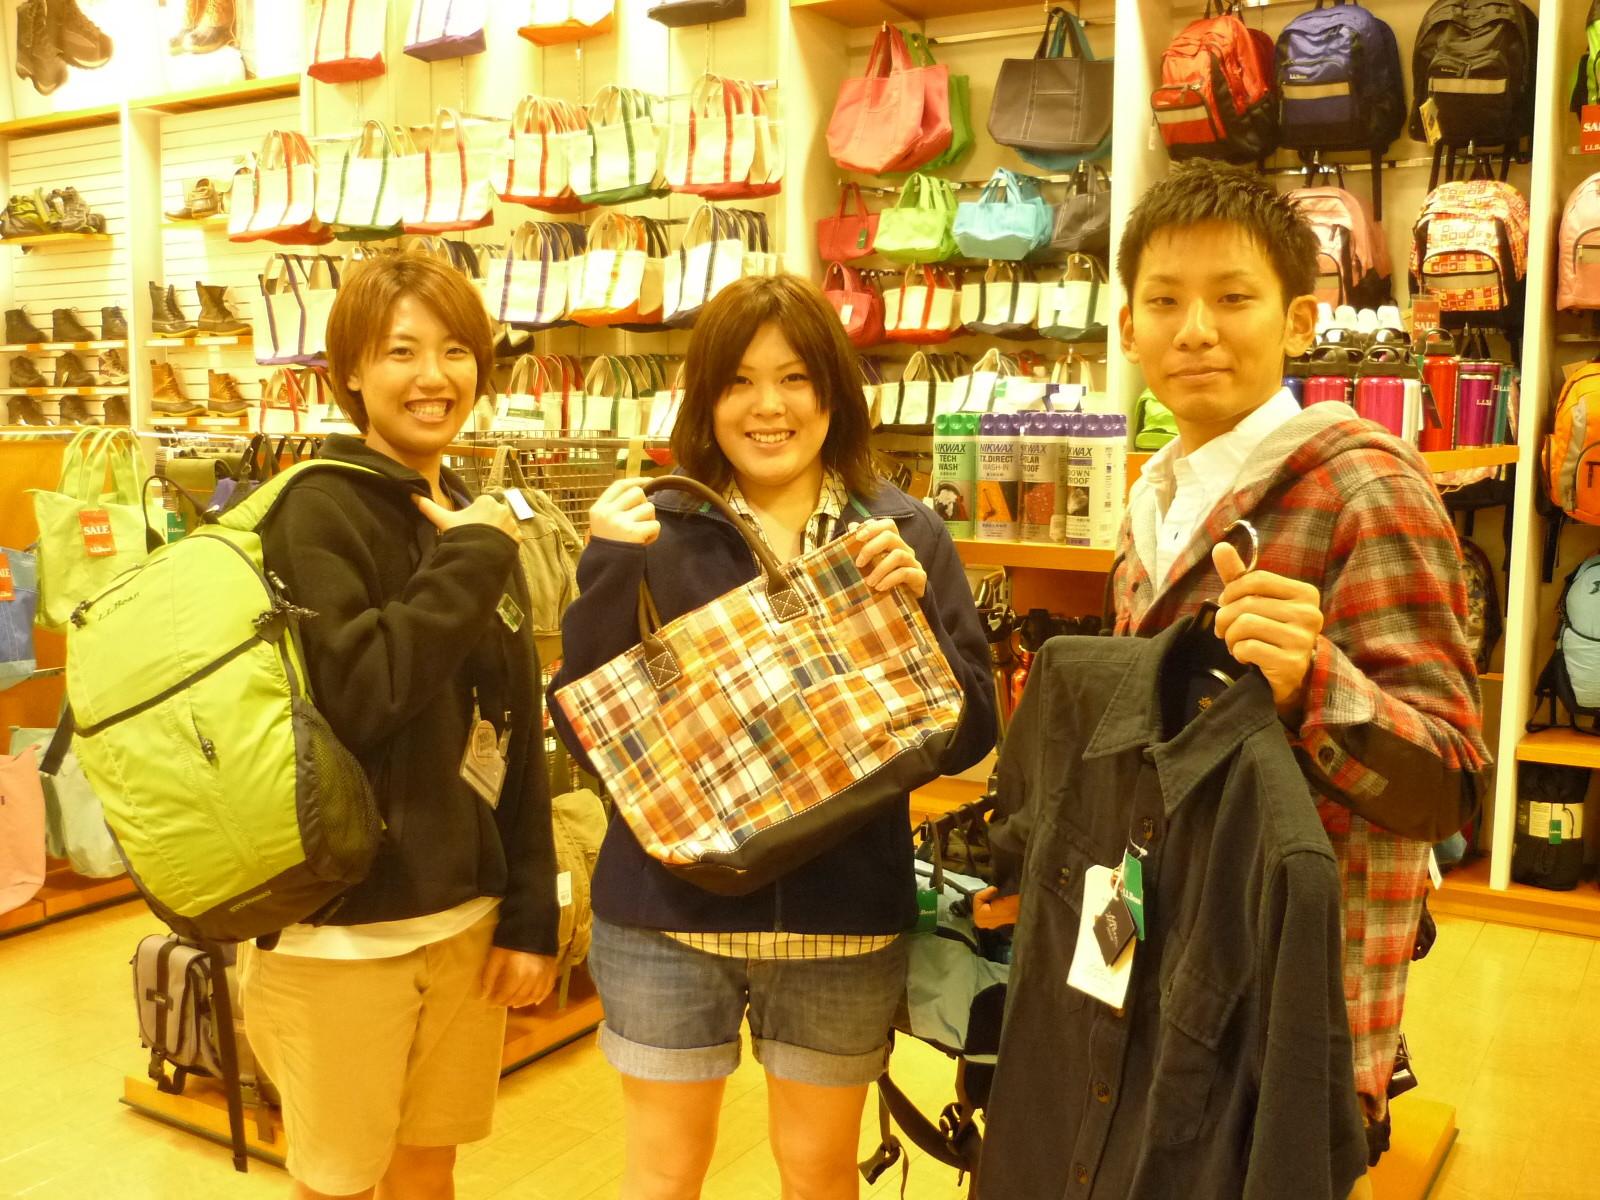 L.L.Bean(エル・エル・ビーン) 神戸店 のアルバイト情報